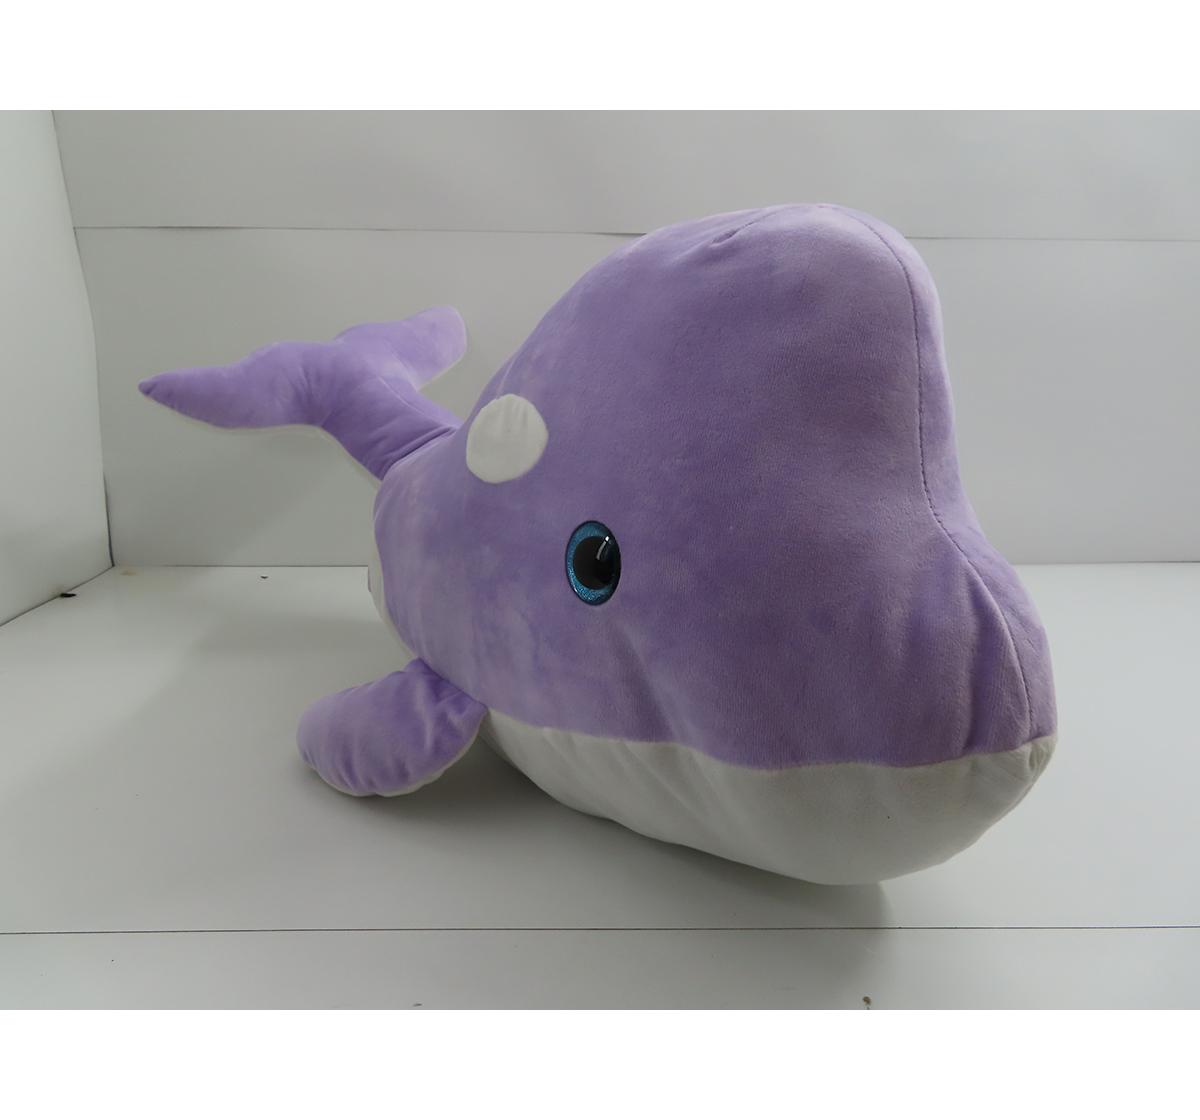 Fuzzbuzz   Fuzzbuzz Dolphin Plush - Purple - 100Cm Quirky Soft Toys for Kids age 12M+ - 33 Cm (Purple)